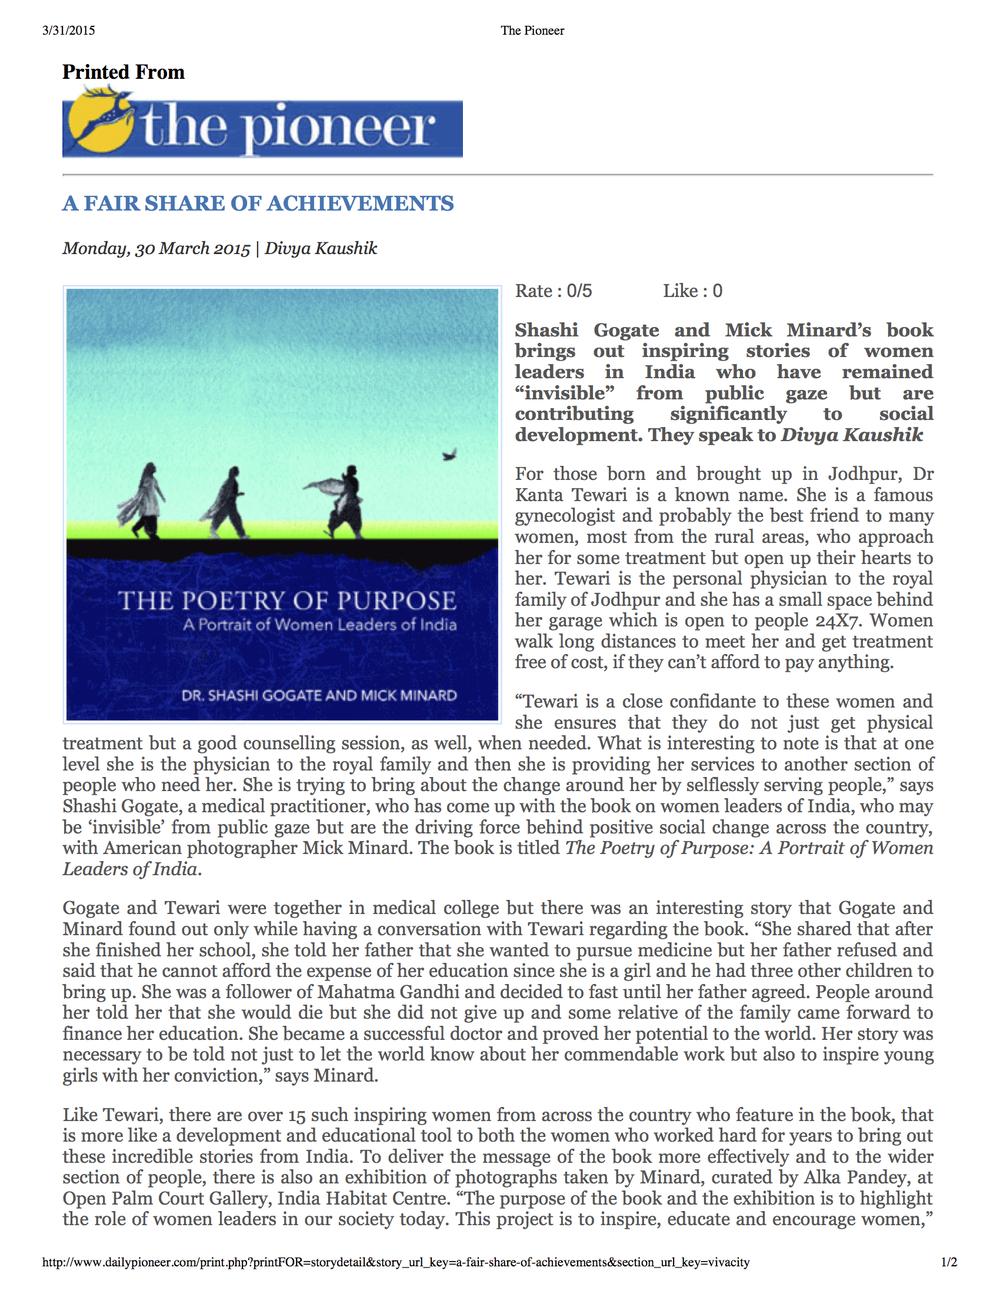 The Pioneer_March 30.jpg